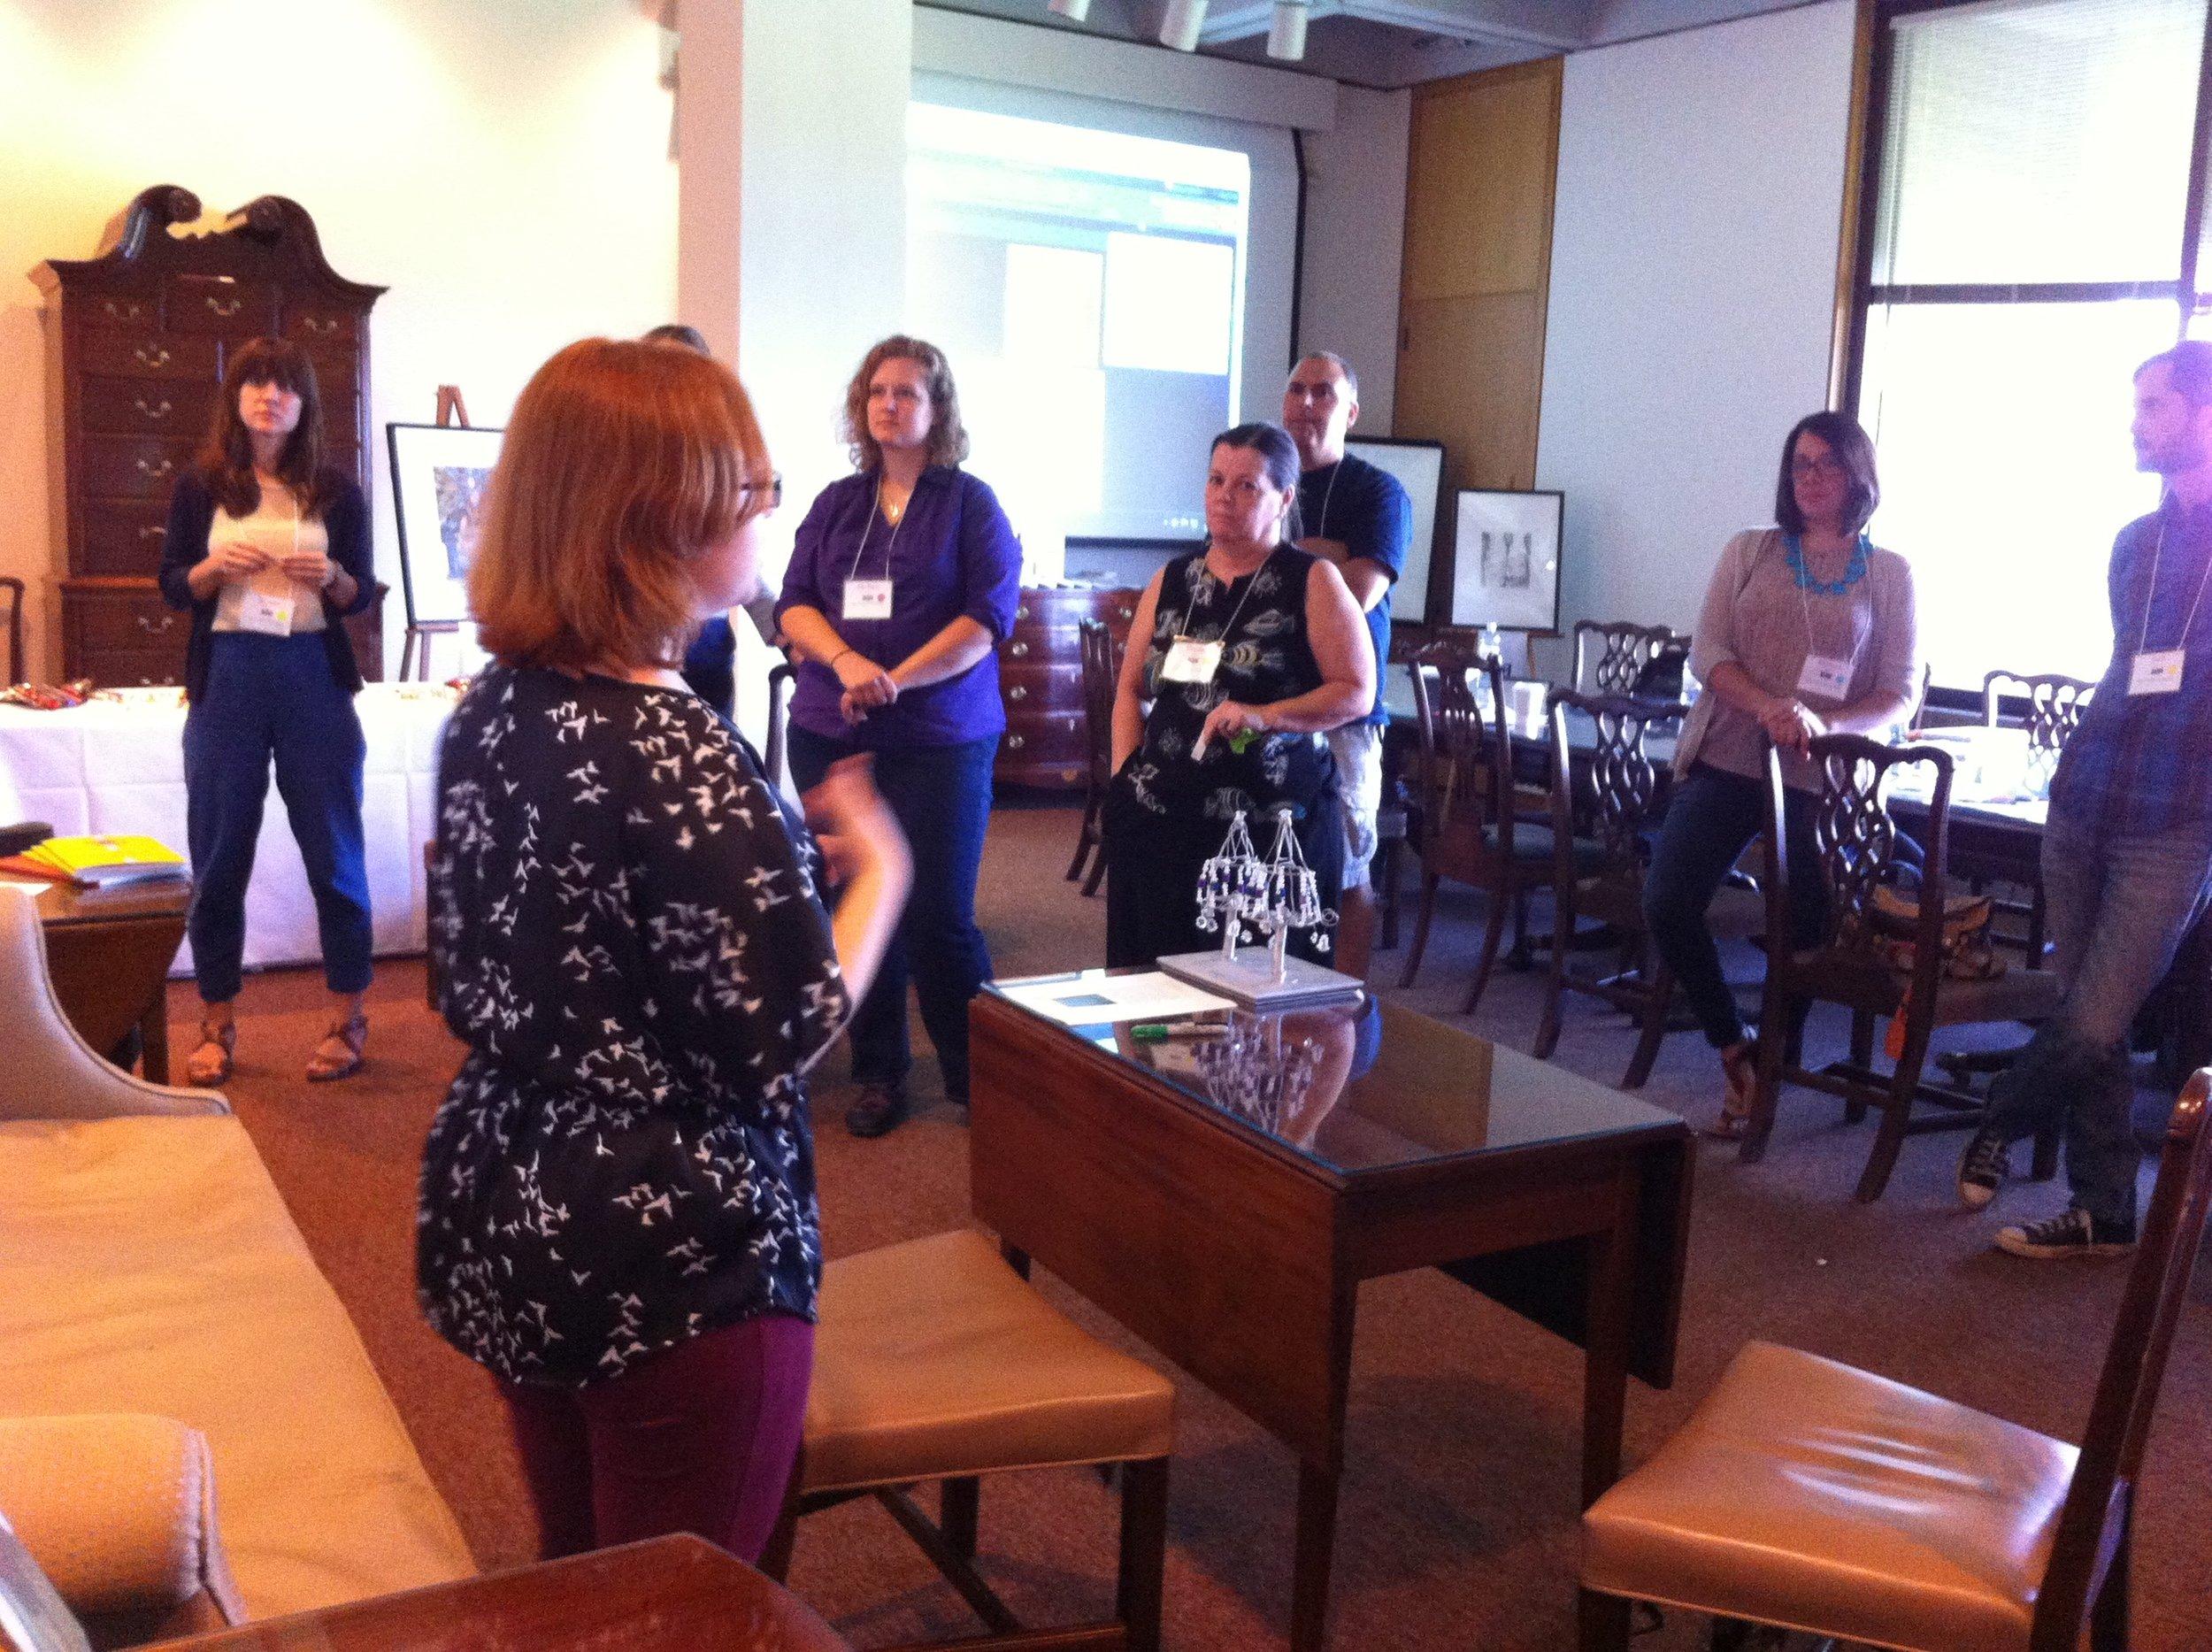 Inviting teachers into the curriculum design process.